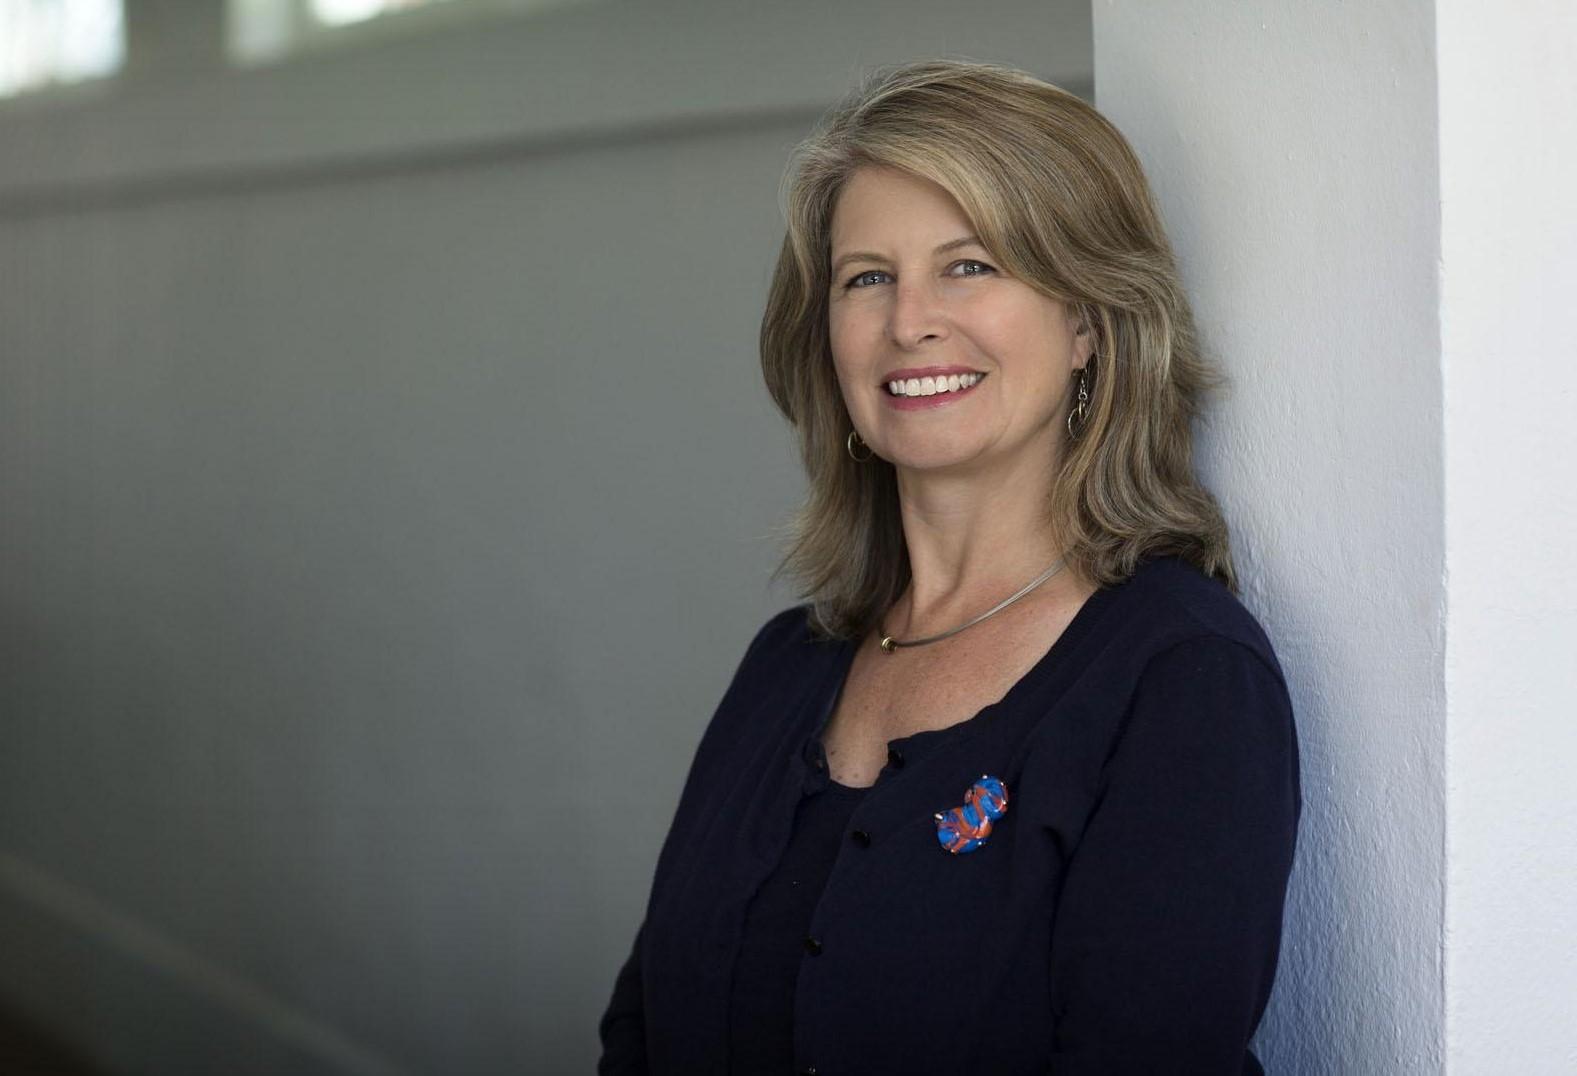 A female UVA staff member smiling